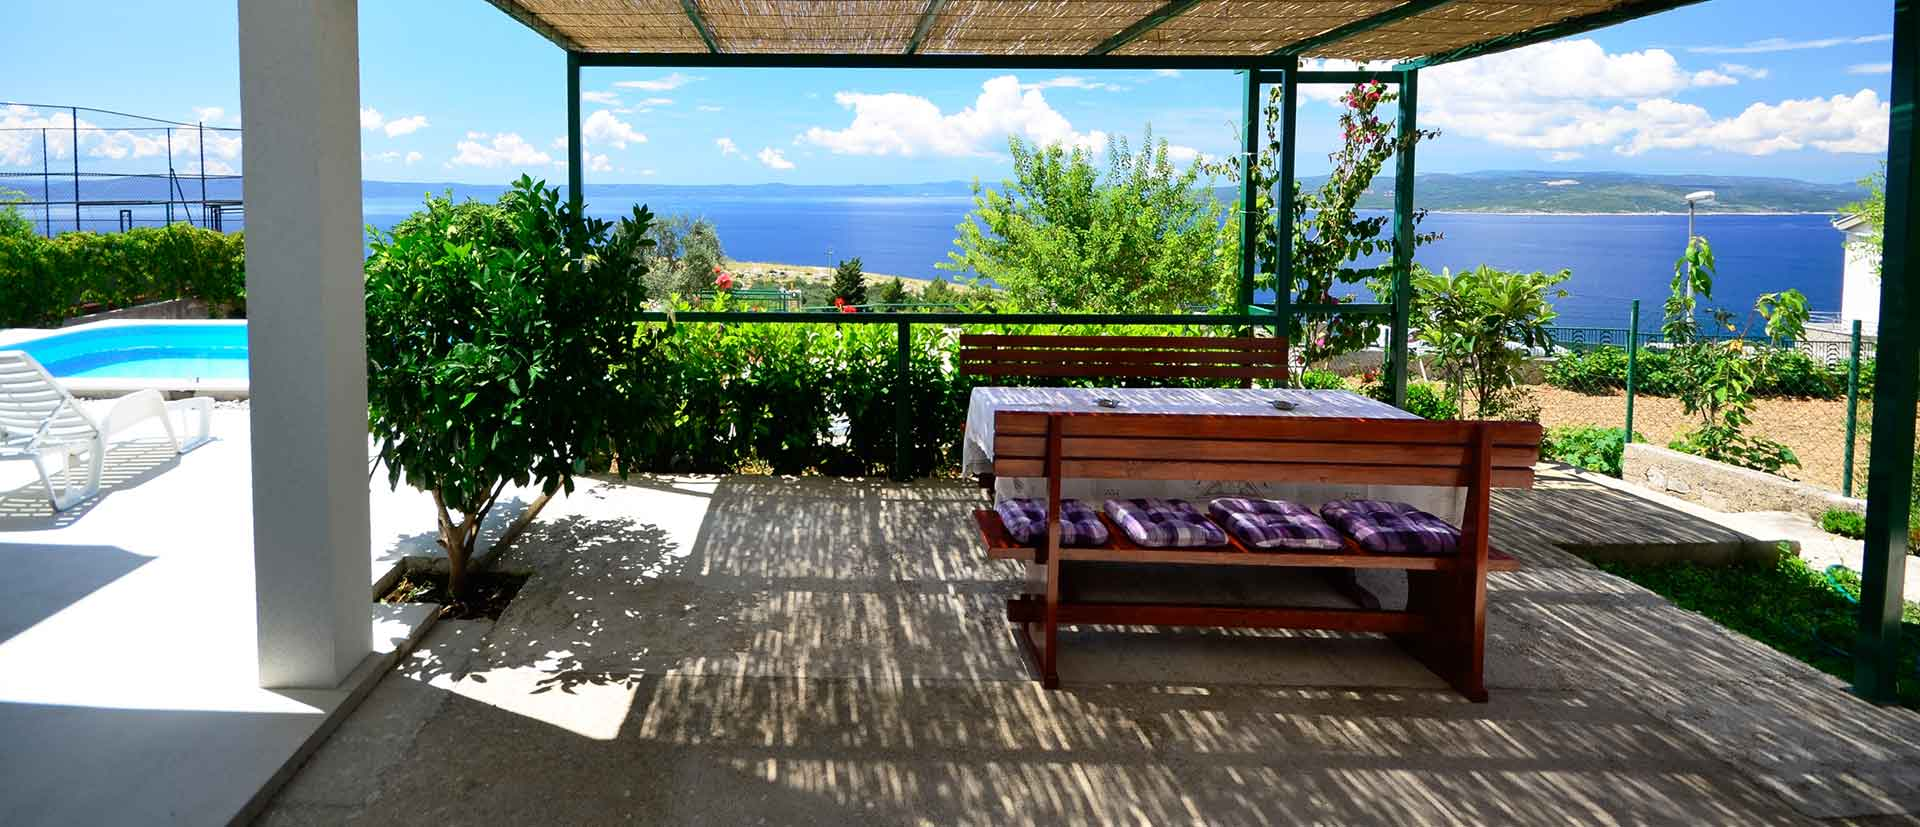 ferienhaus makarska mit pool ferienhaus kuk. Black Bedroom Furniture Sets. Home Design Ideas